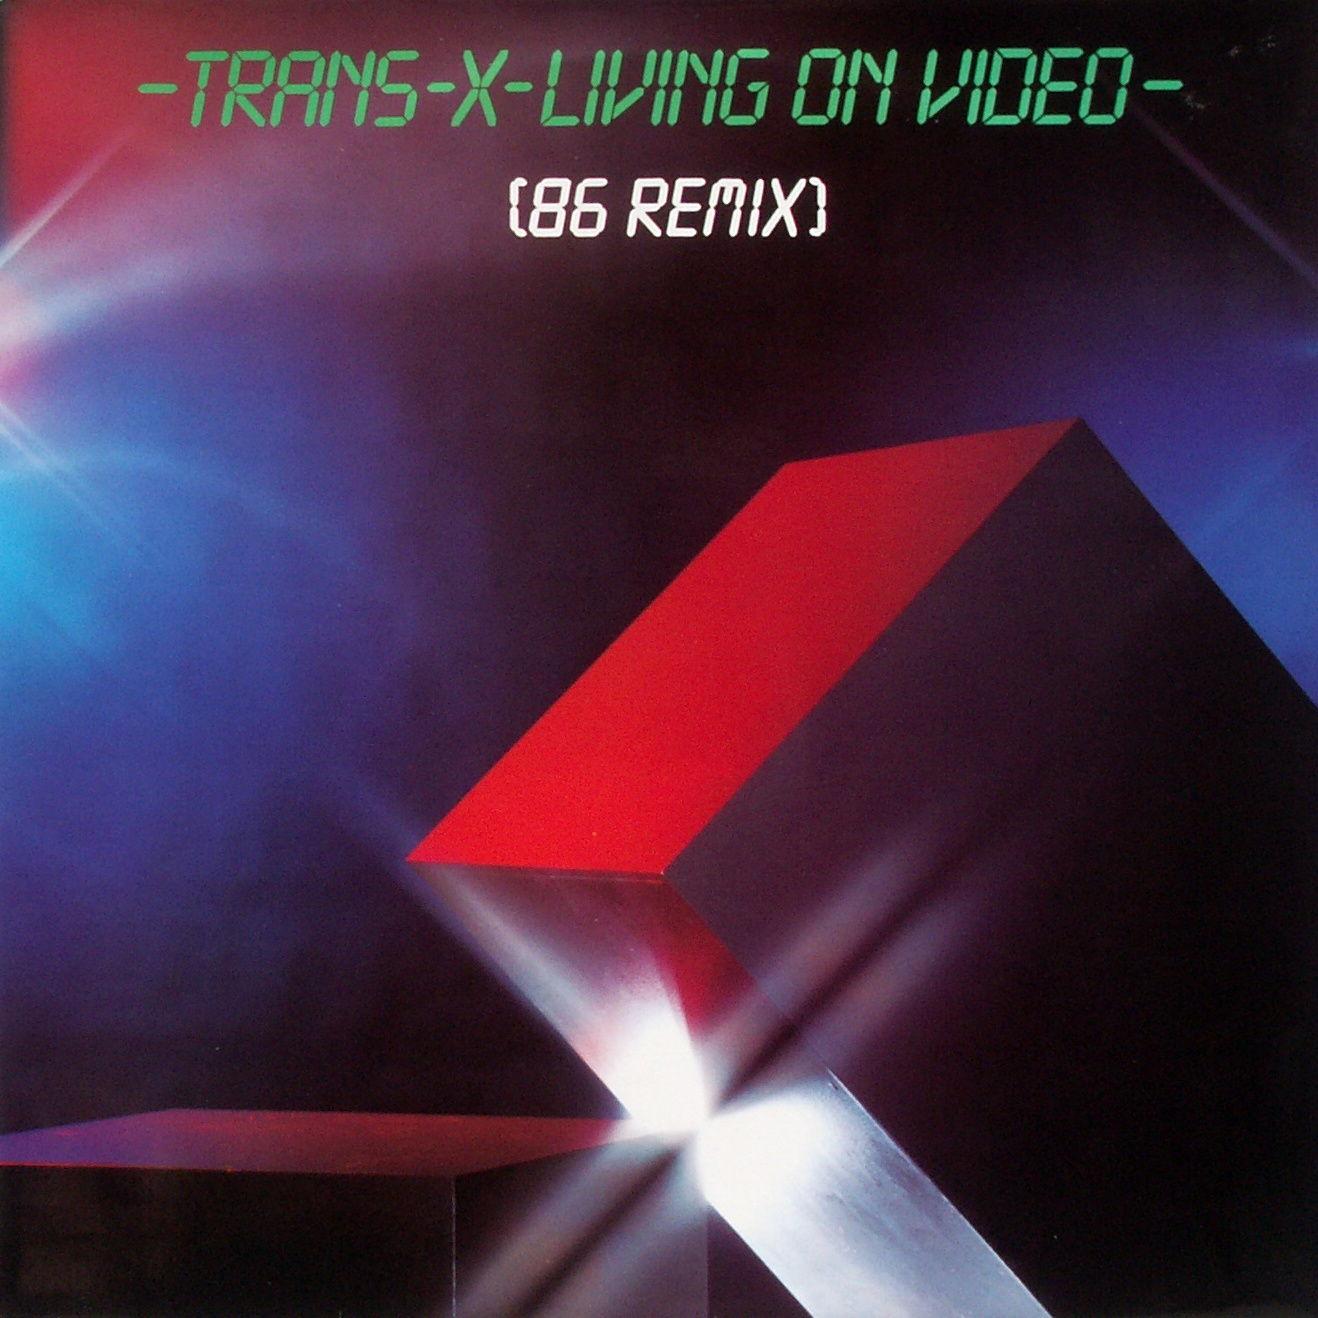 TRANS-X - Living On Video '86 Remix - 12 inch x 1